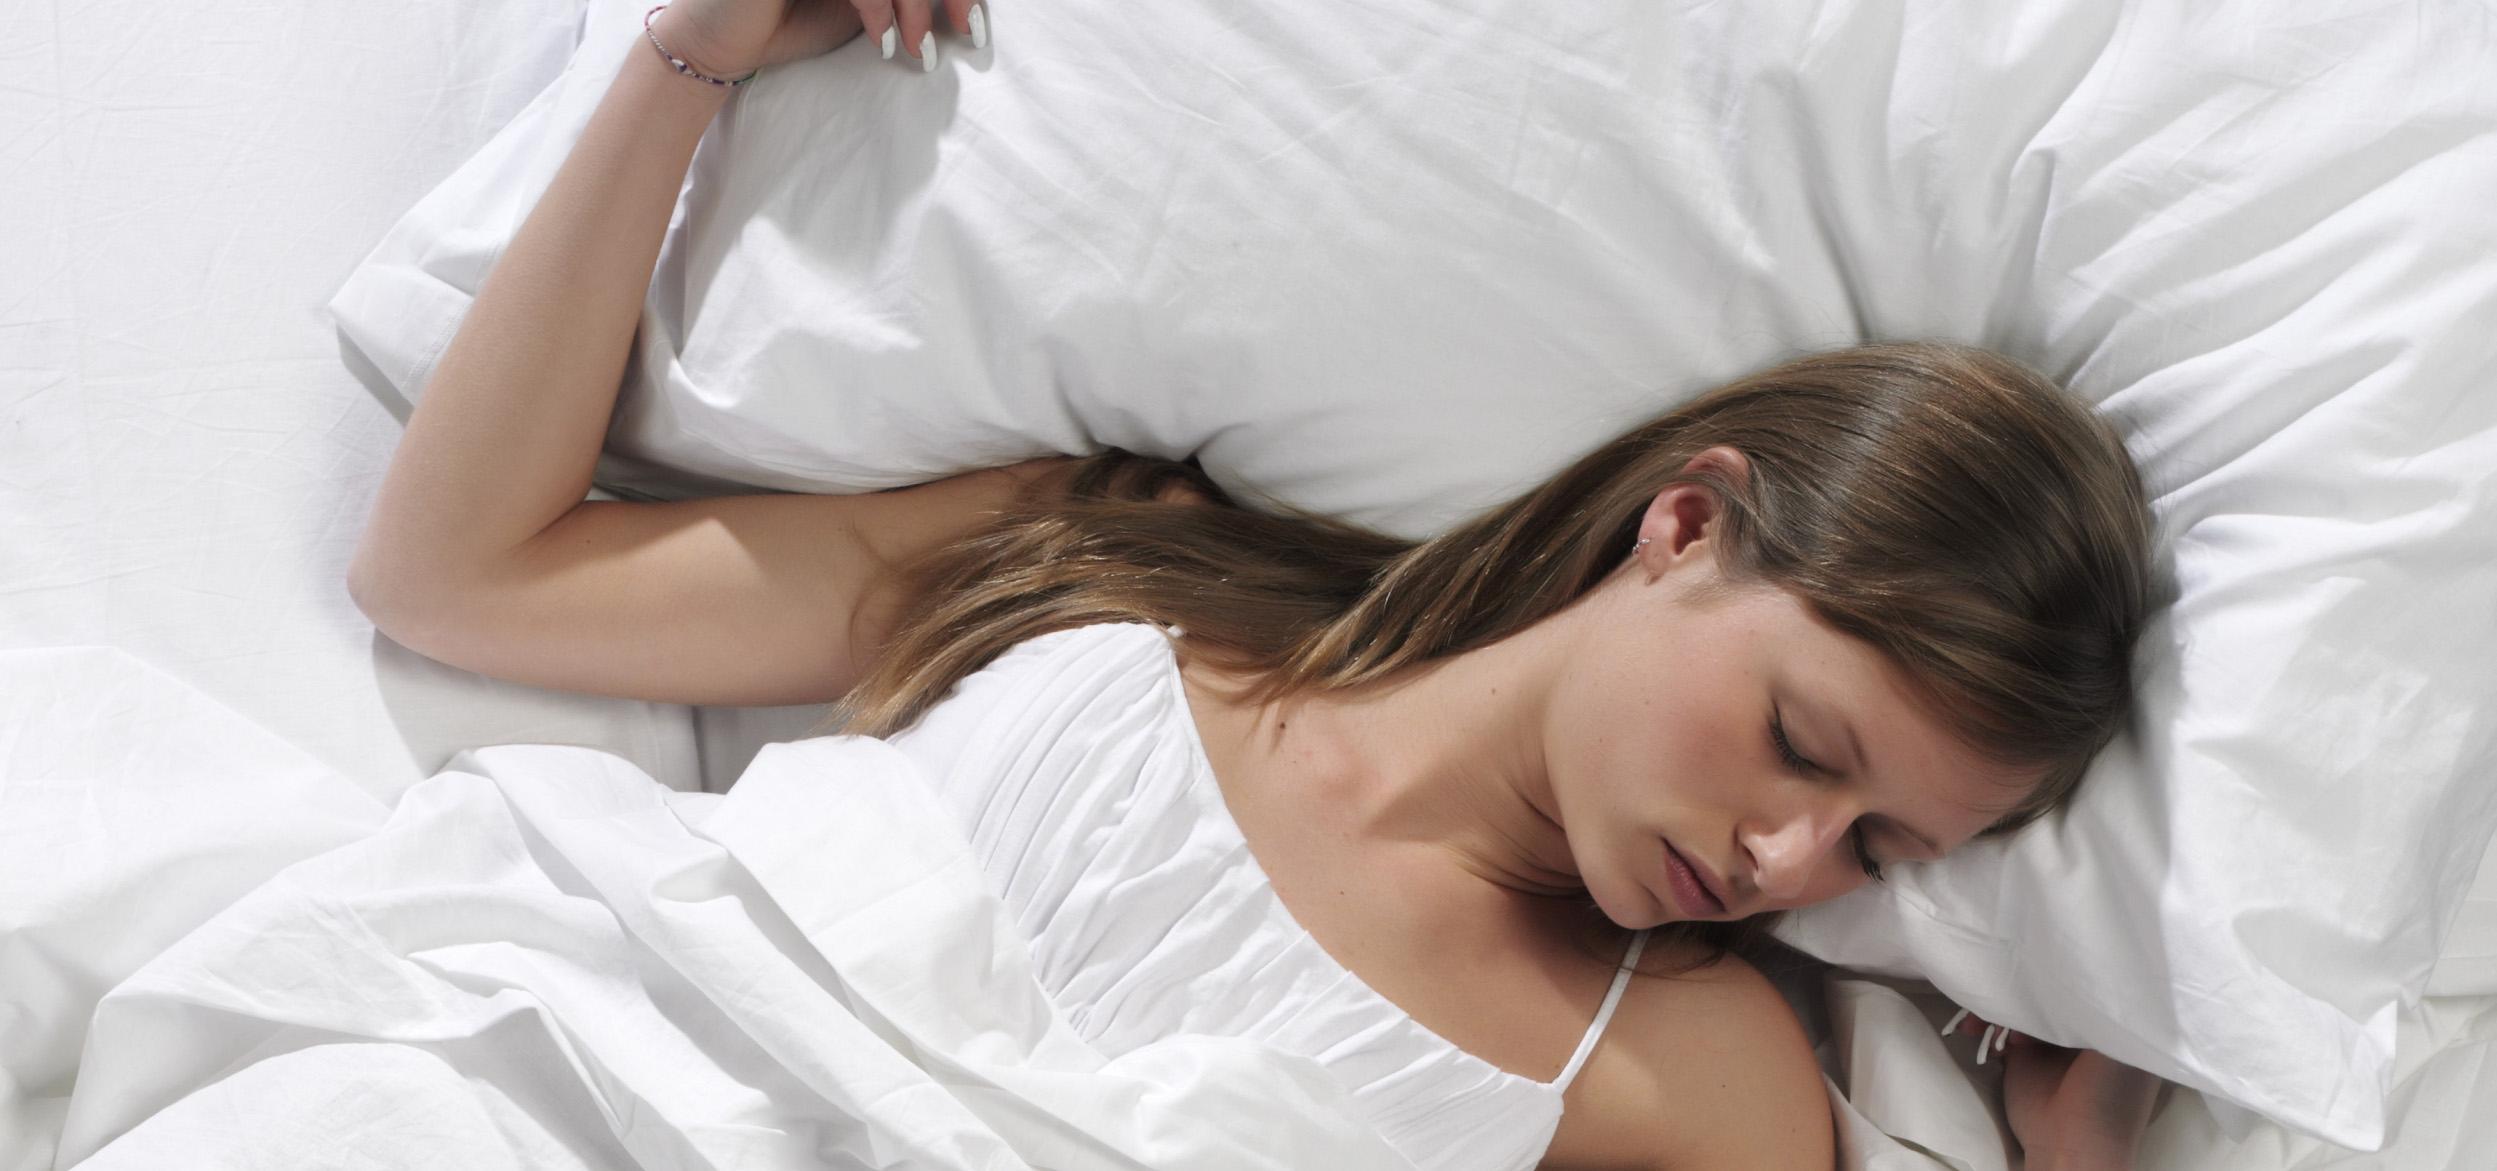 Conforttex colchones, bases, almohadas